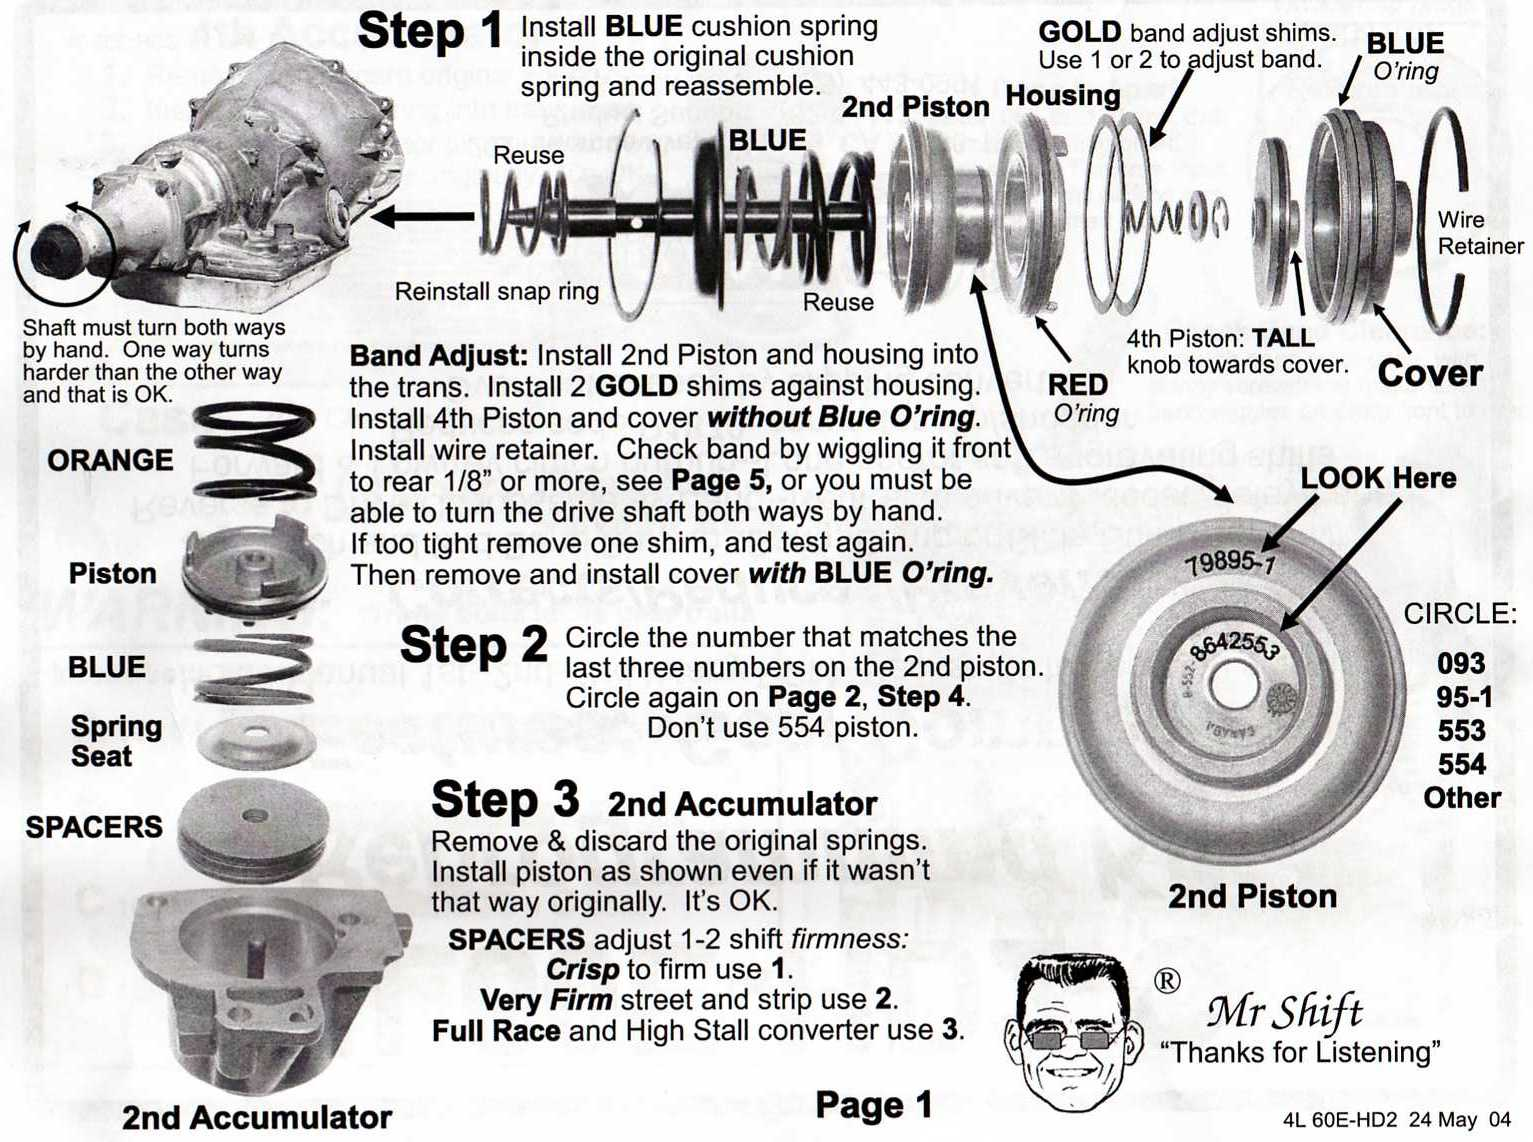 700r4 servo diagram wiring diagram 700r4 servo diagram wiring diagram load 700r4 servo diagram